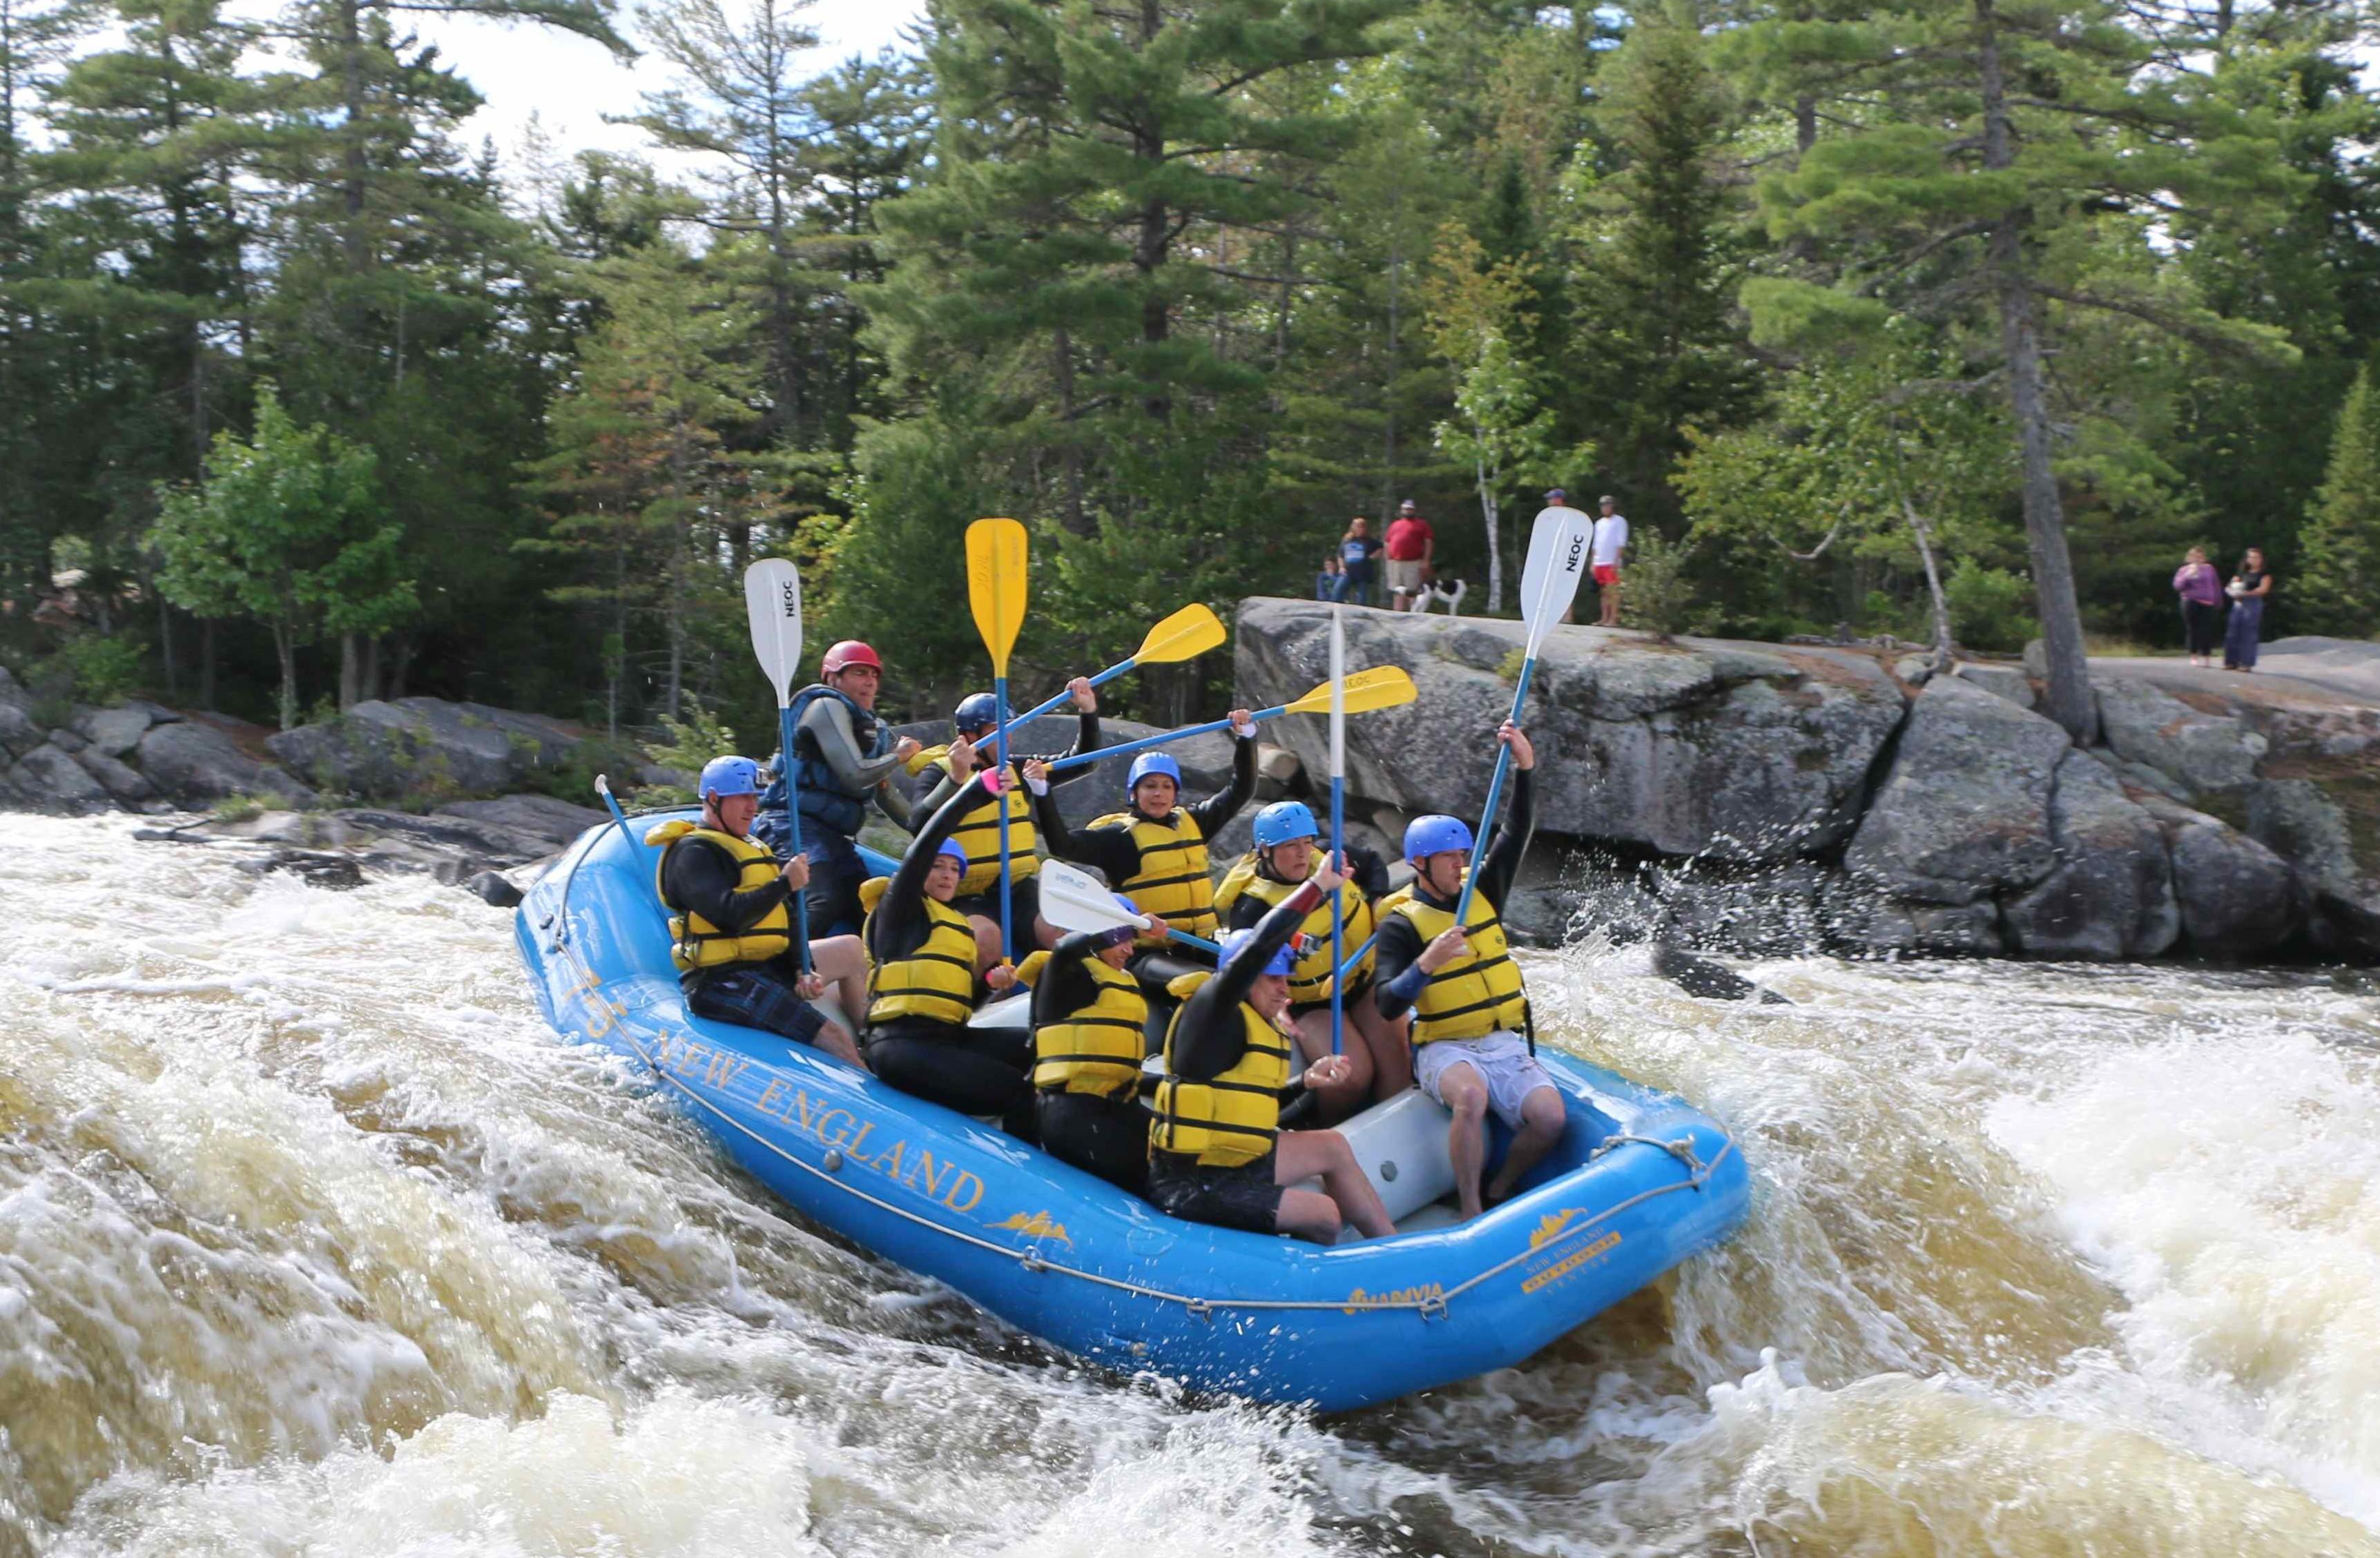 White Water Rafting Trips near Millinocket Lake in Maine ...